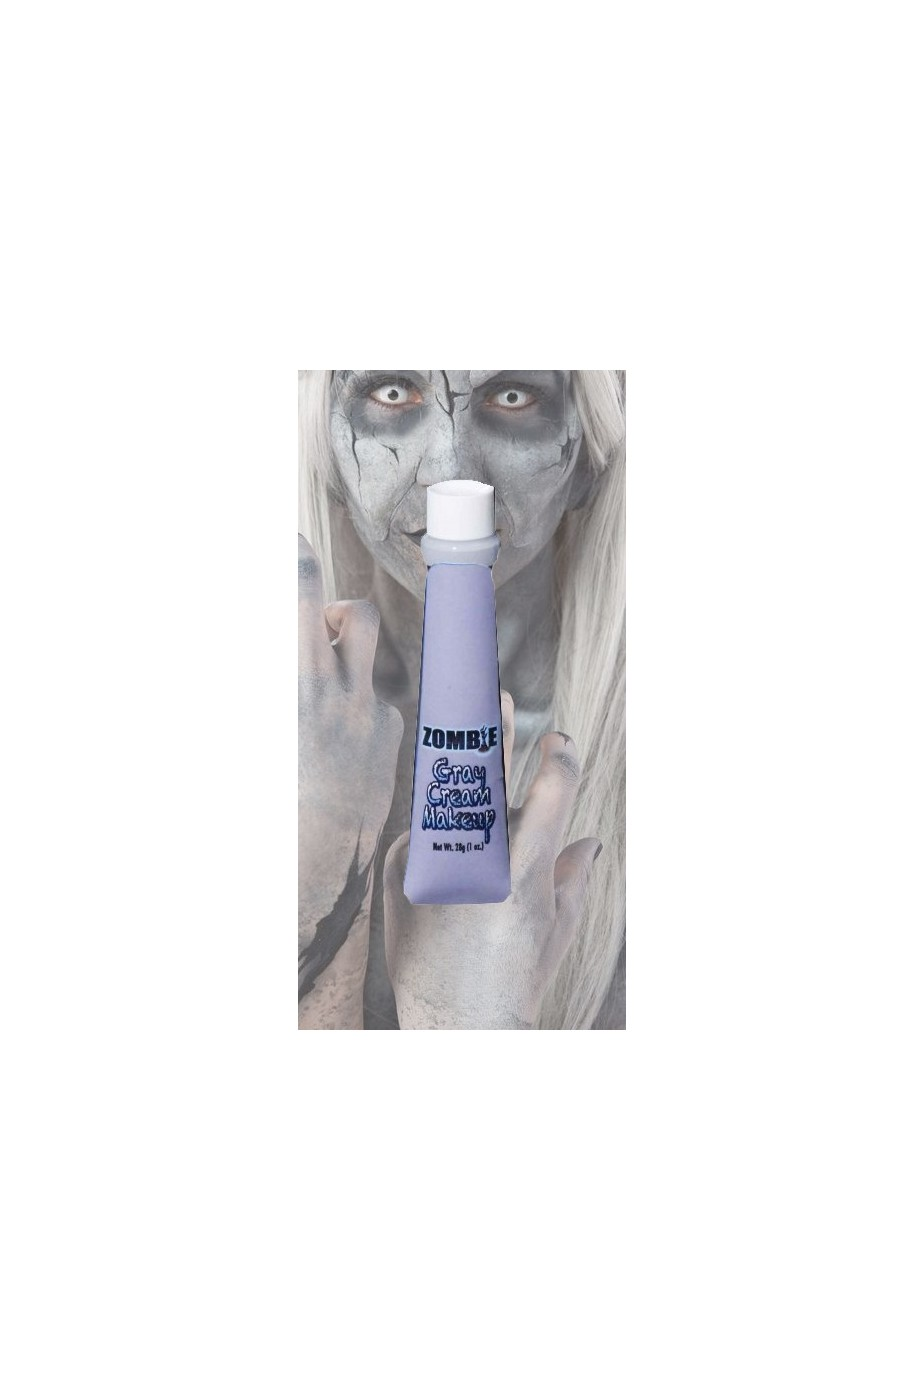 Trucco fondotinta grigio zombie, pietra, statue